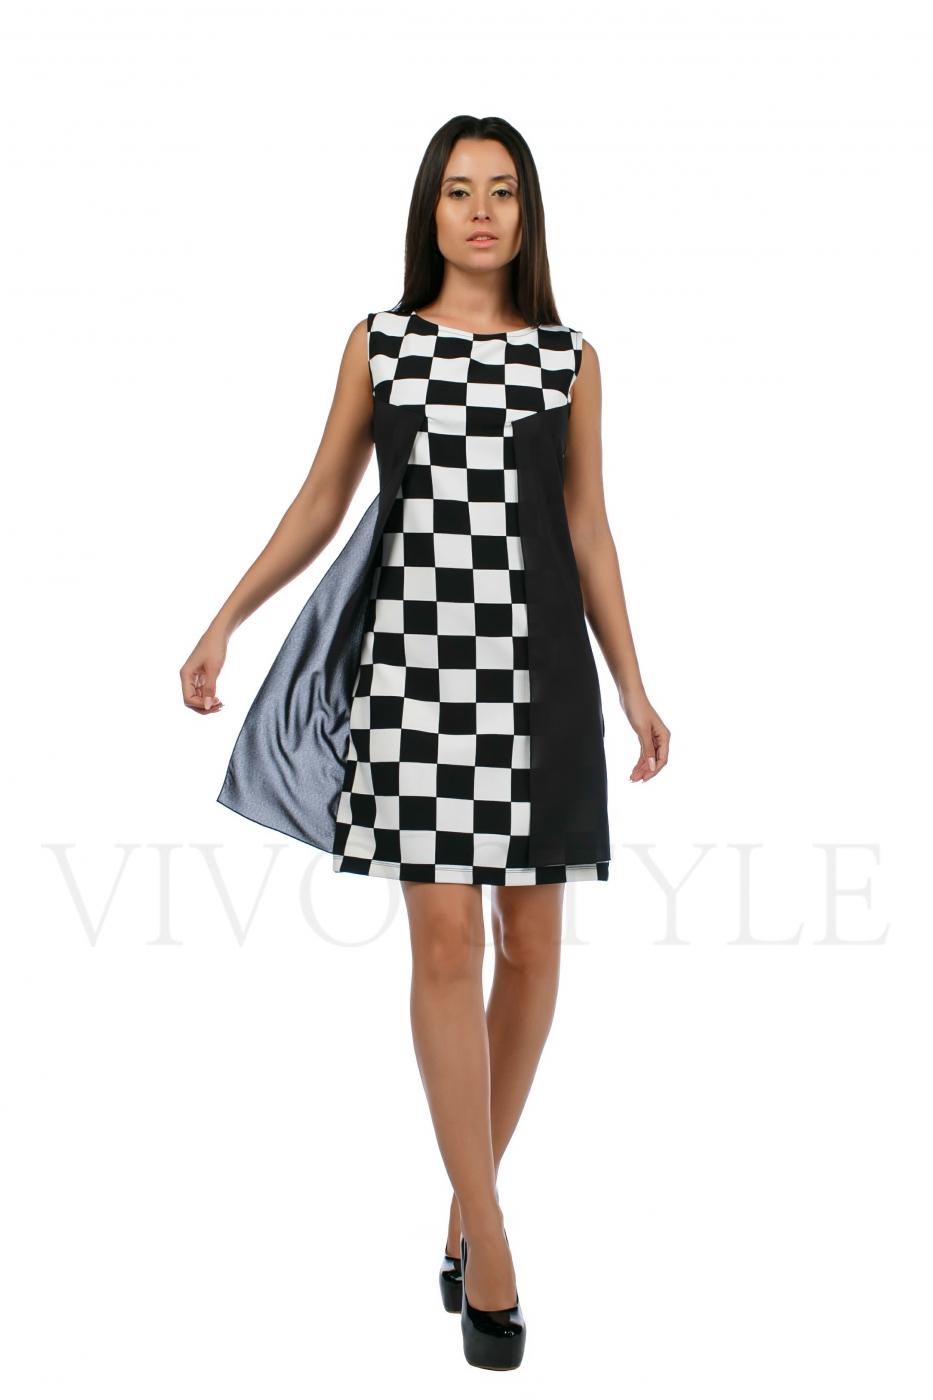 066dcdefd98 летнее красивое платье с патерном шашечки